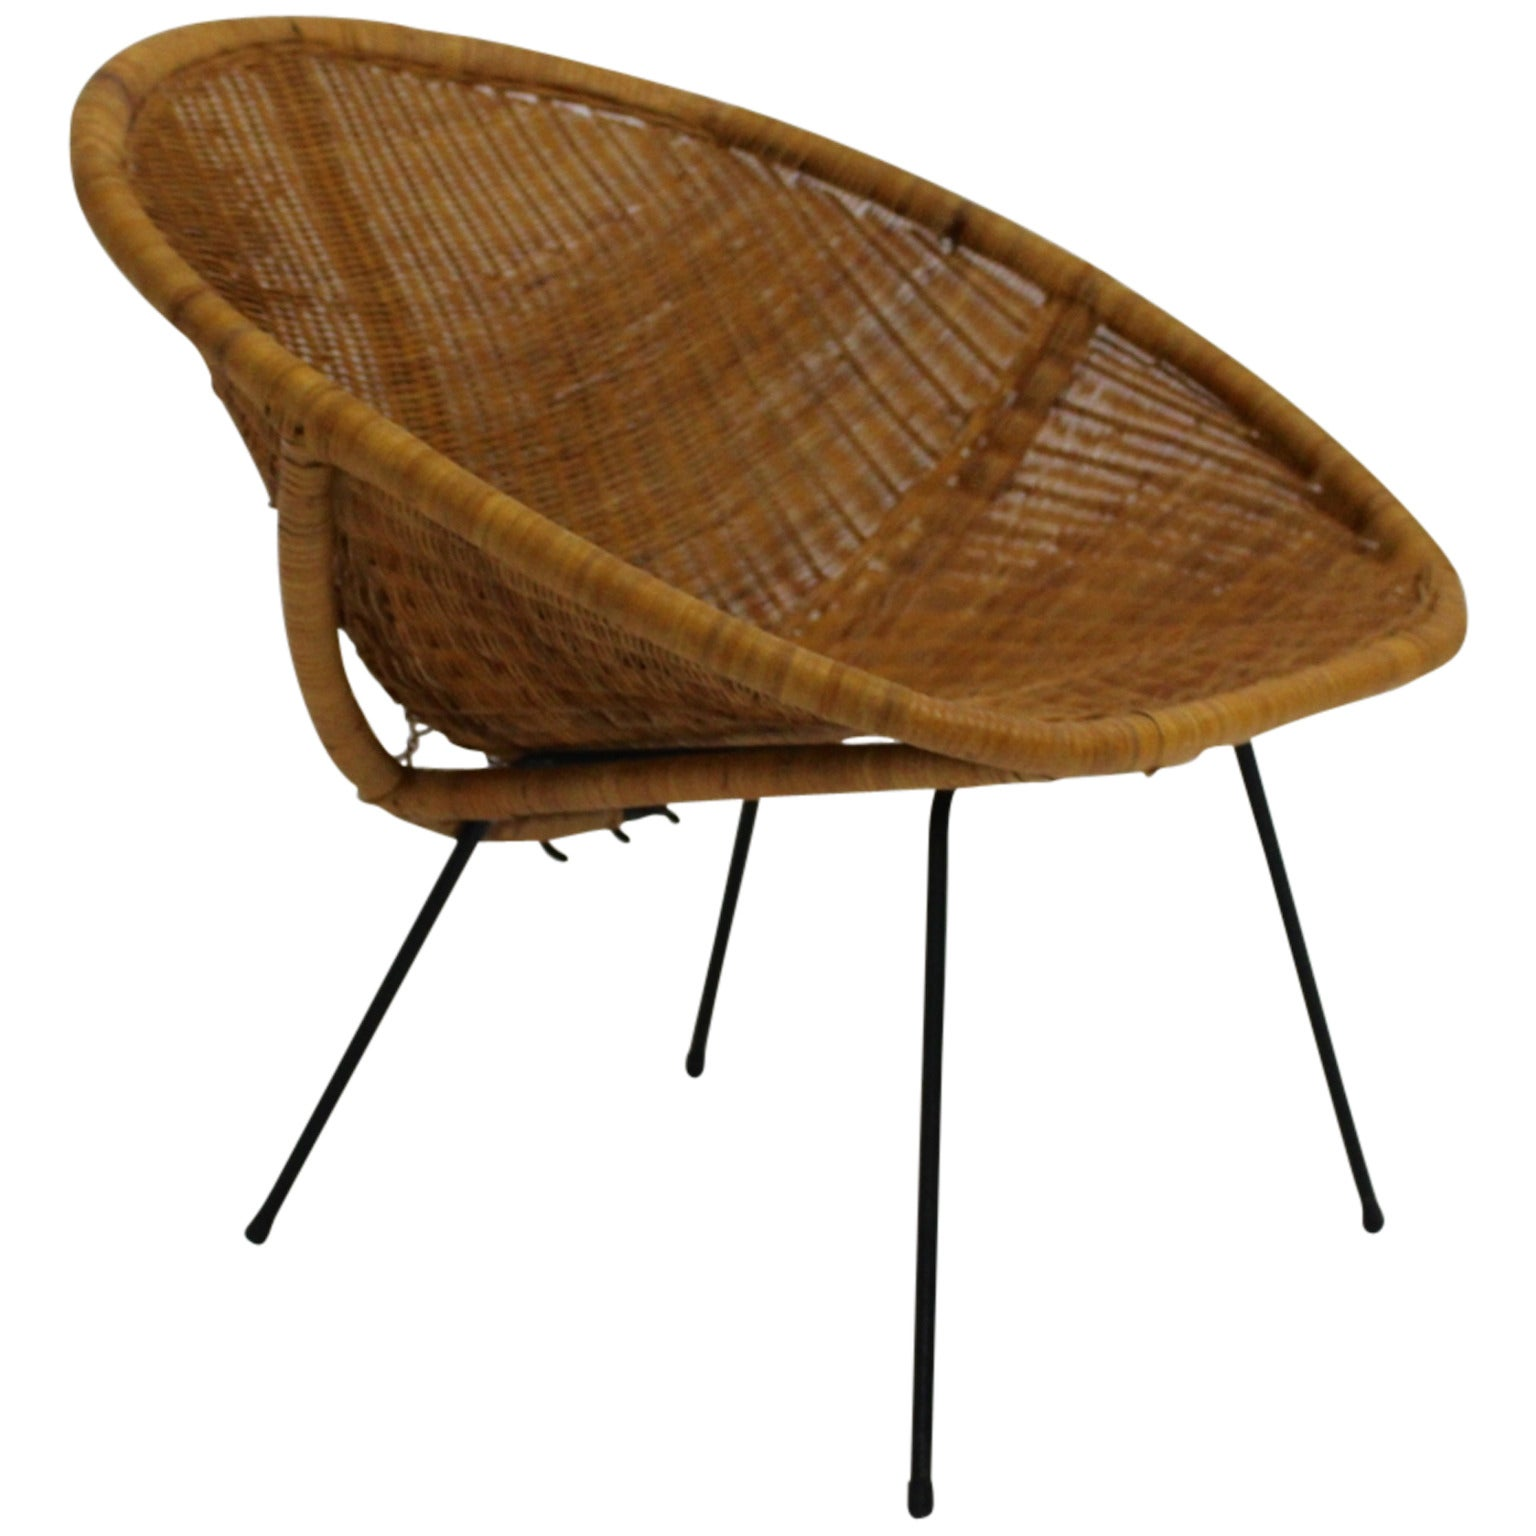 Mid Century Modern Vintage  Rattan Club Chair France 1950s